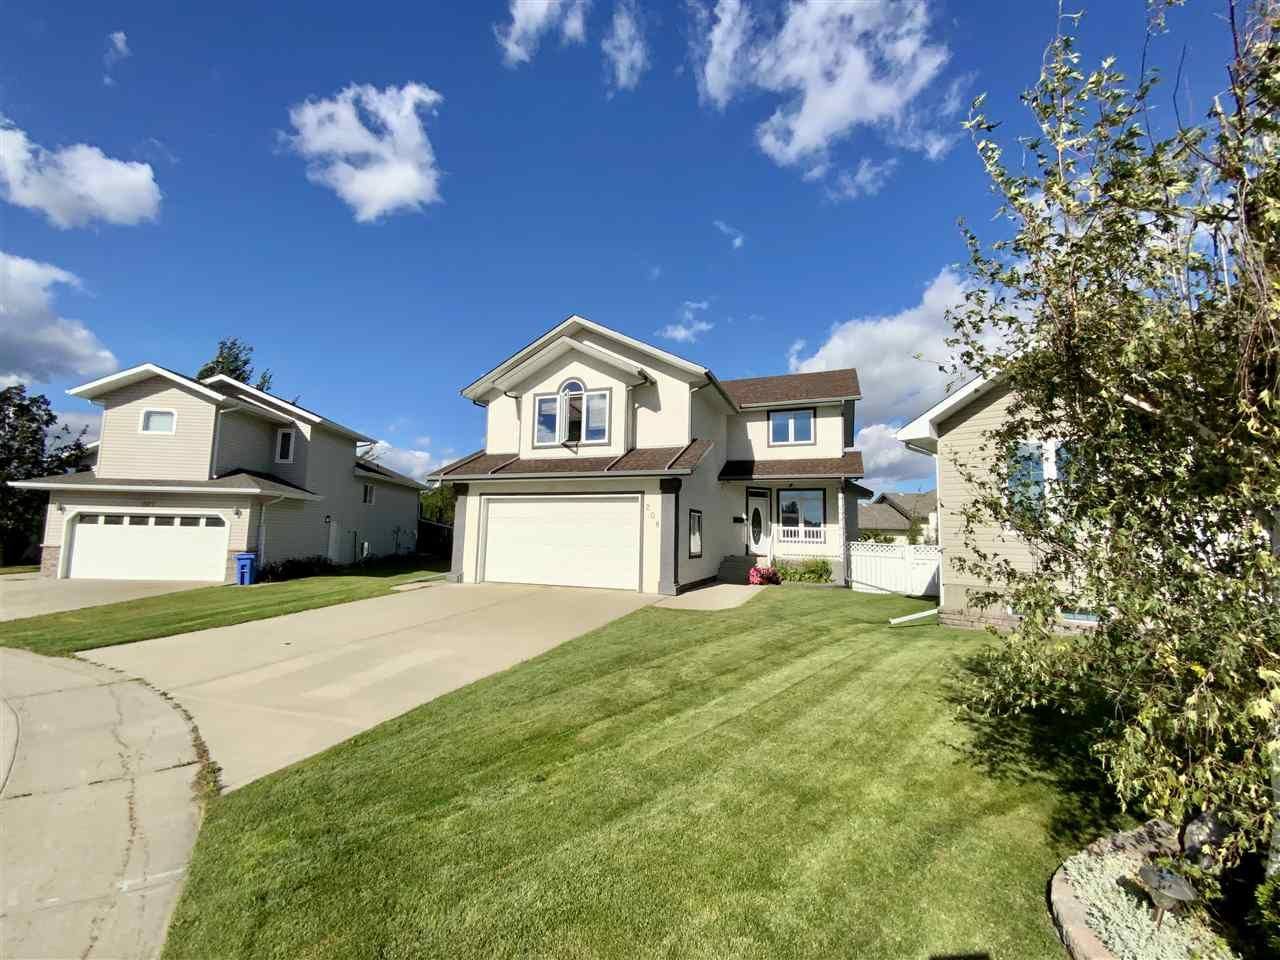 Main Photo: 208 Parkglen Close: Wetaskiwin House for sale : MLS®# E4252924